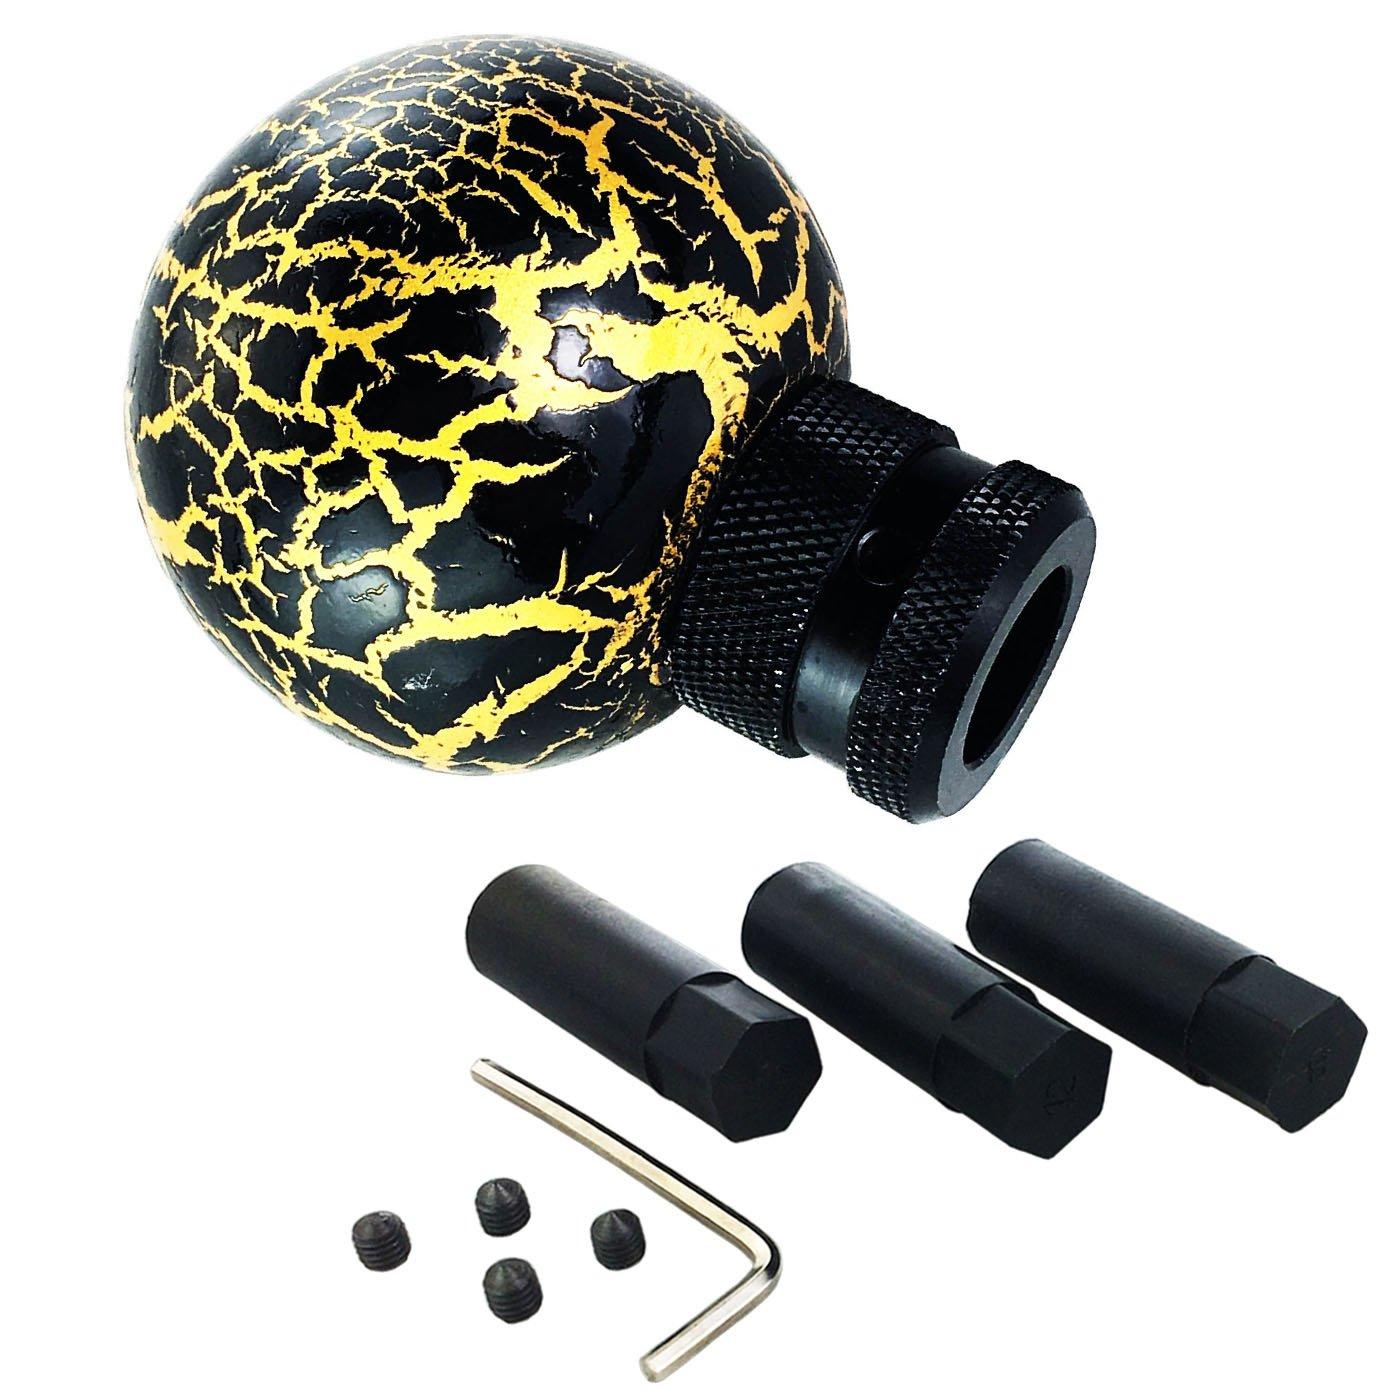 Black Lunsom Ball Shift Knob Resin Gear Transmission Shifter Car Shifting Stick Handle Head Fit Universal Automatic Manual Vehicle